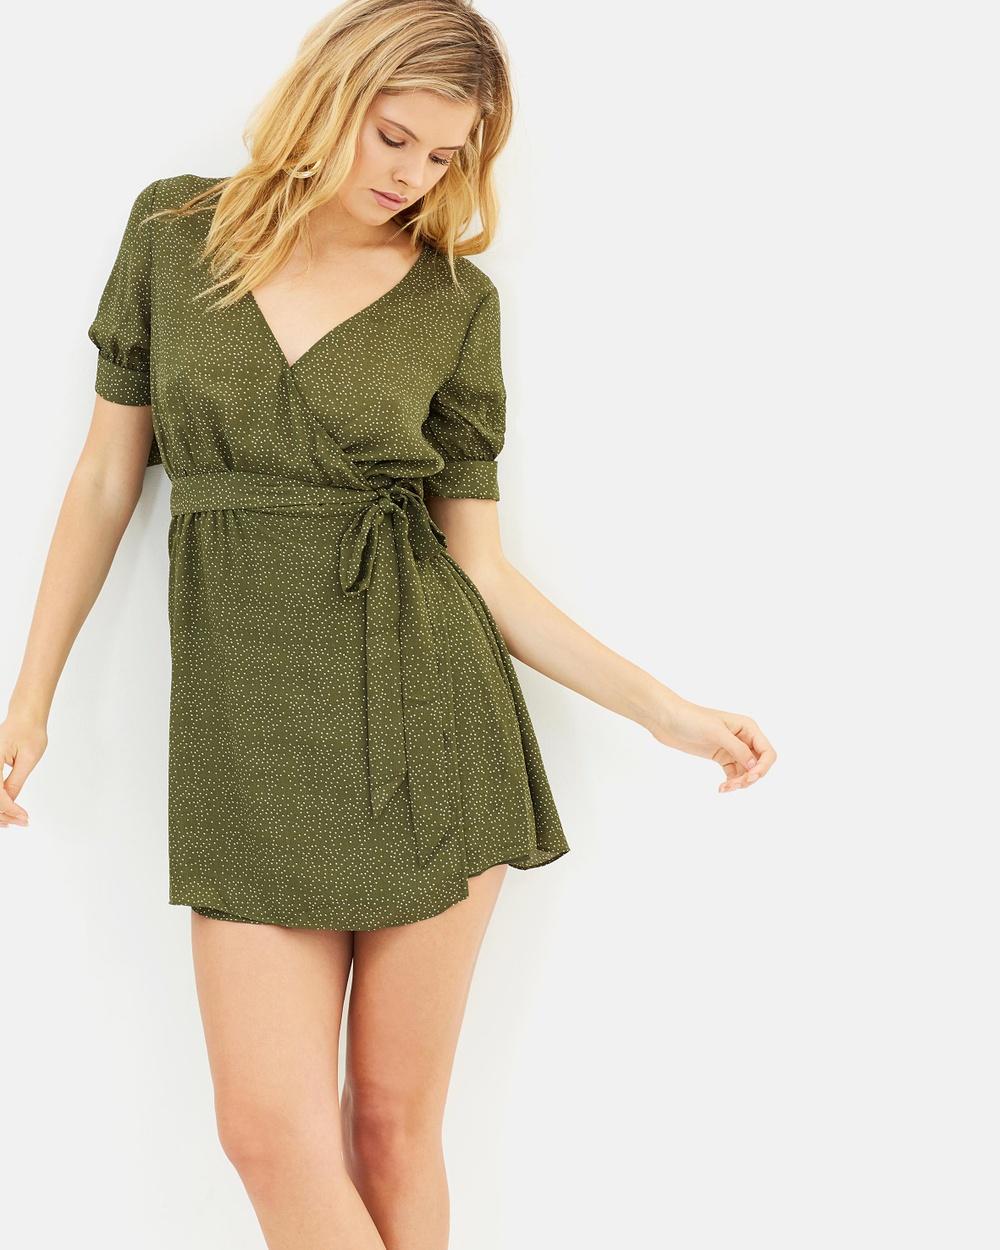 The East Order Ren Mini Dress Printed Dresses Olive Spot Ren Mini Dress